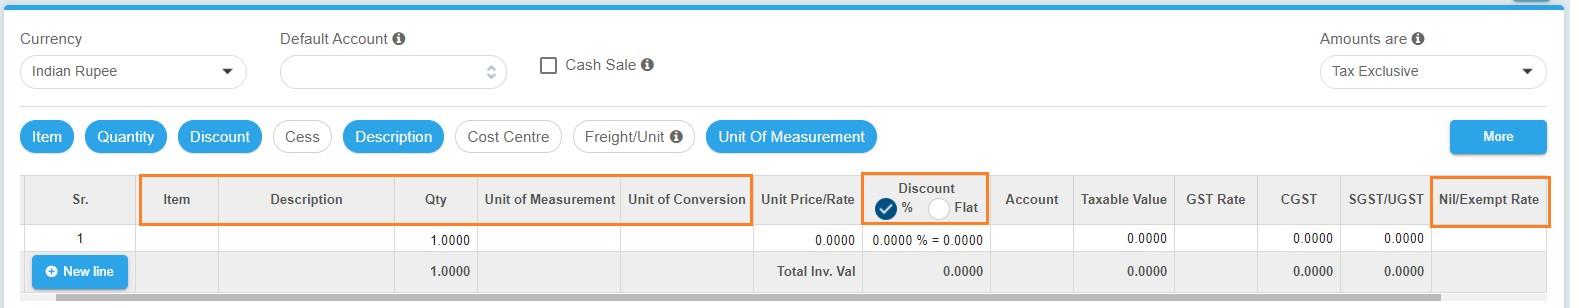 custom-item-details-showing-in-sales